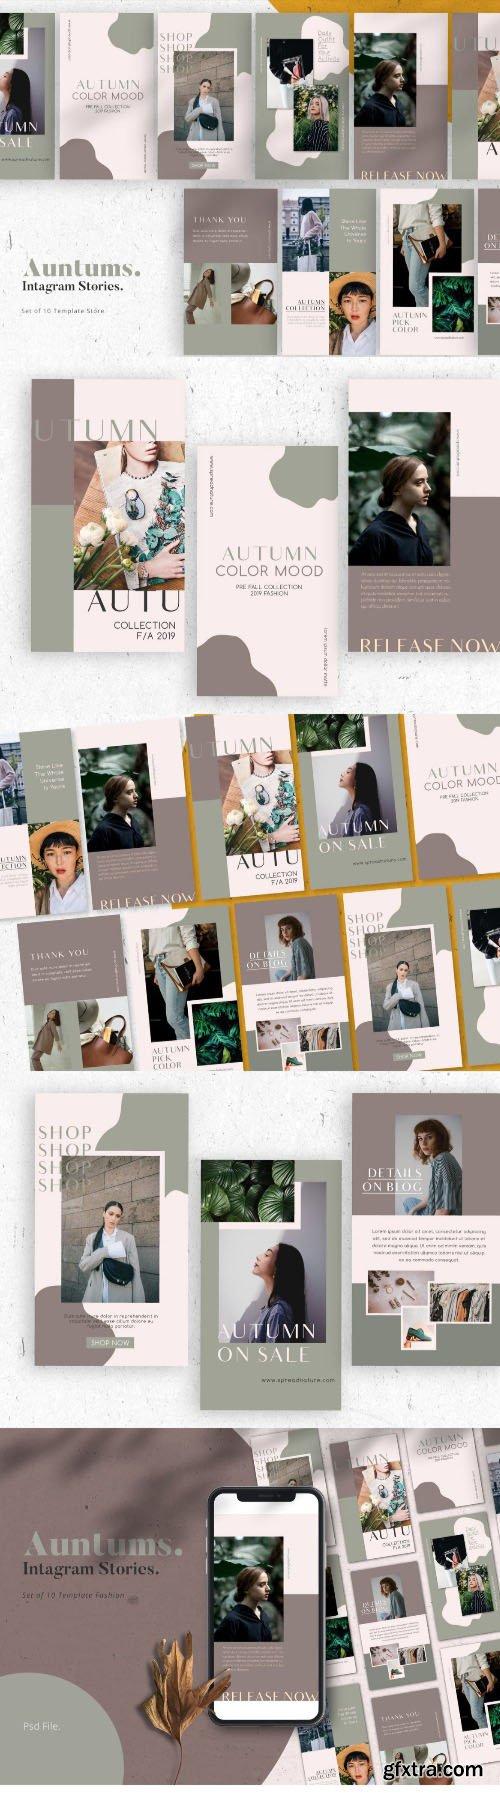 Auntums Promotion Intagram Stories